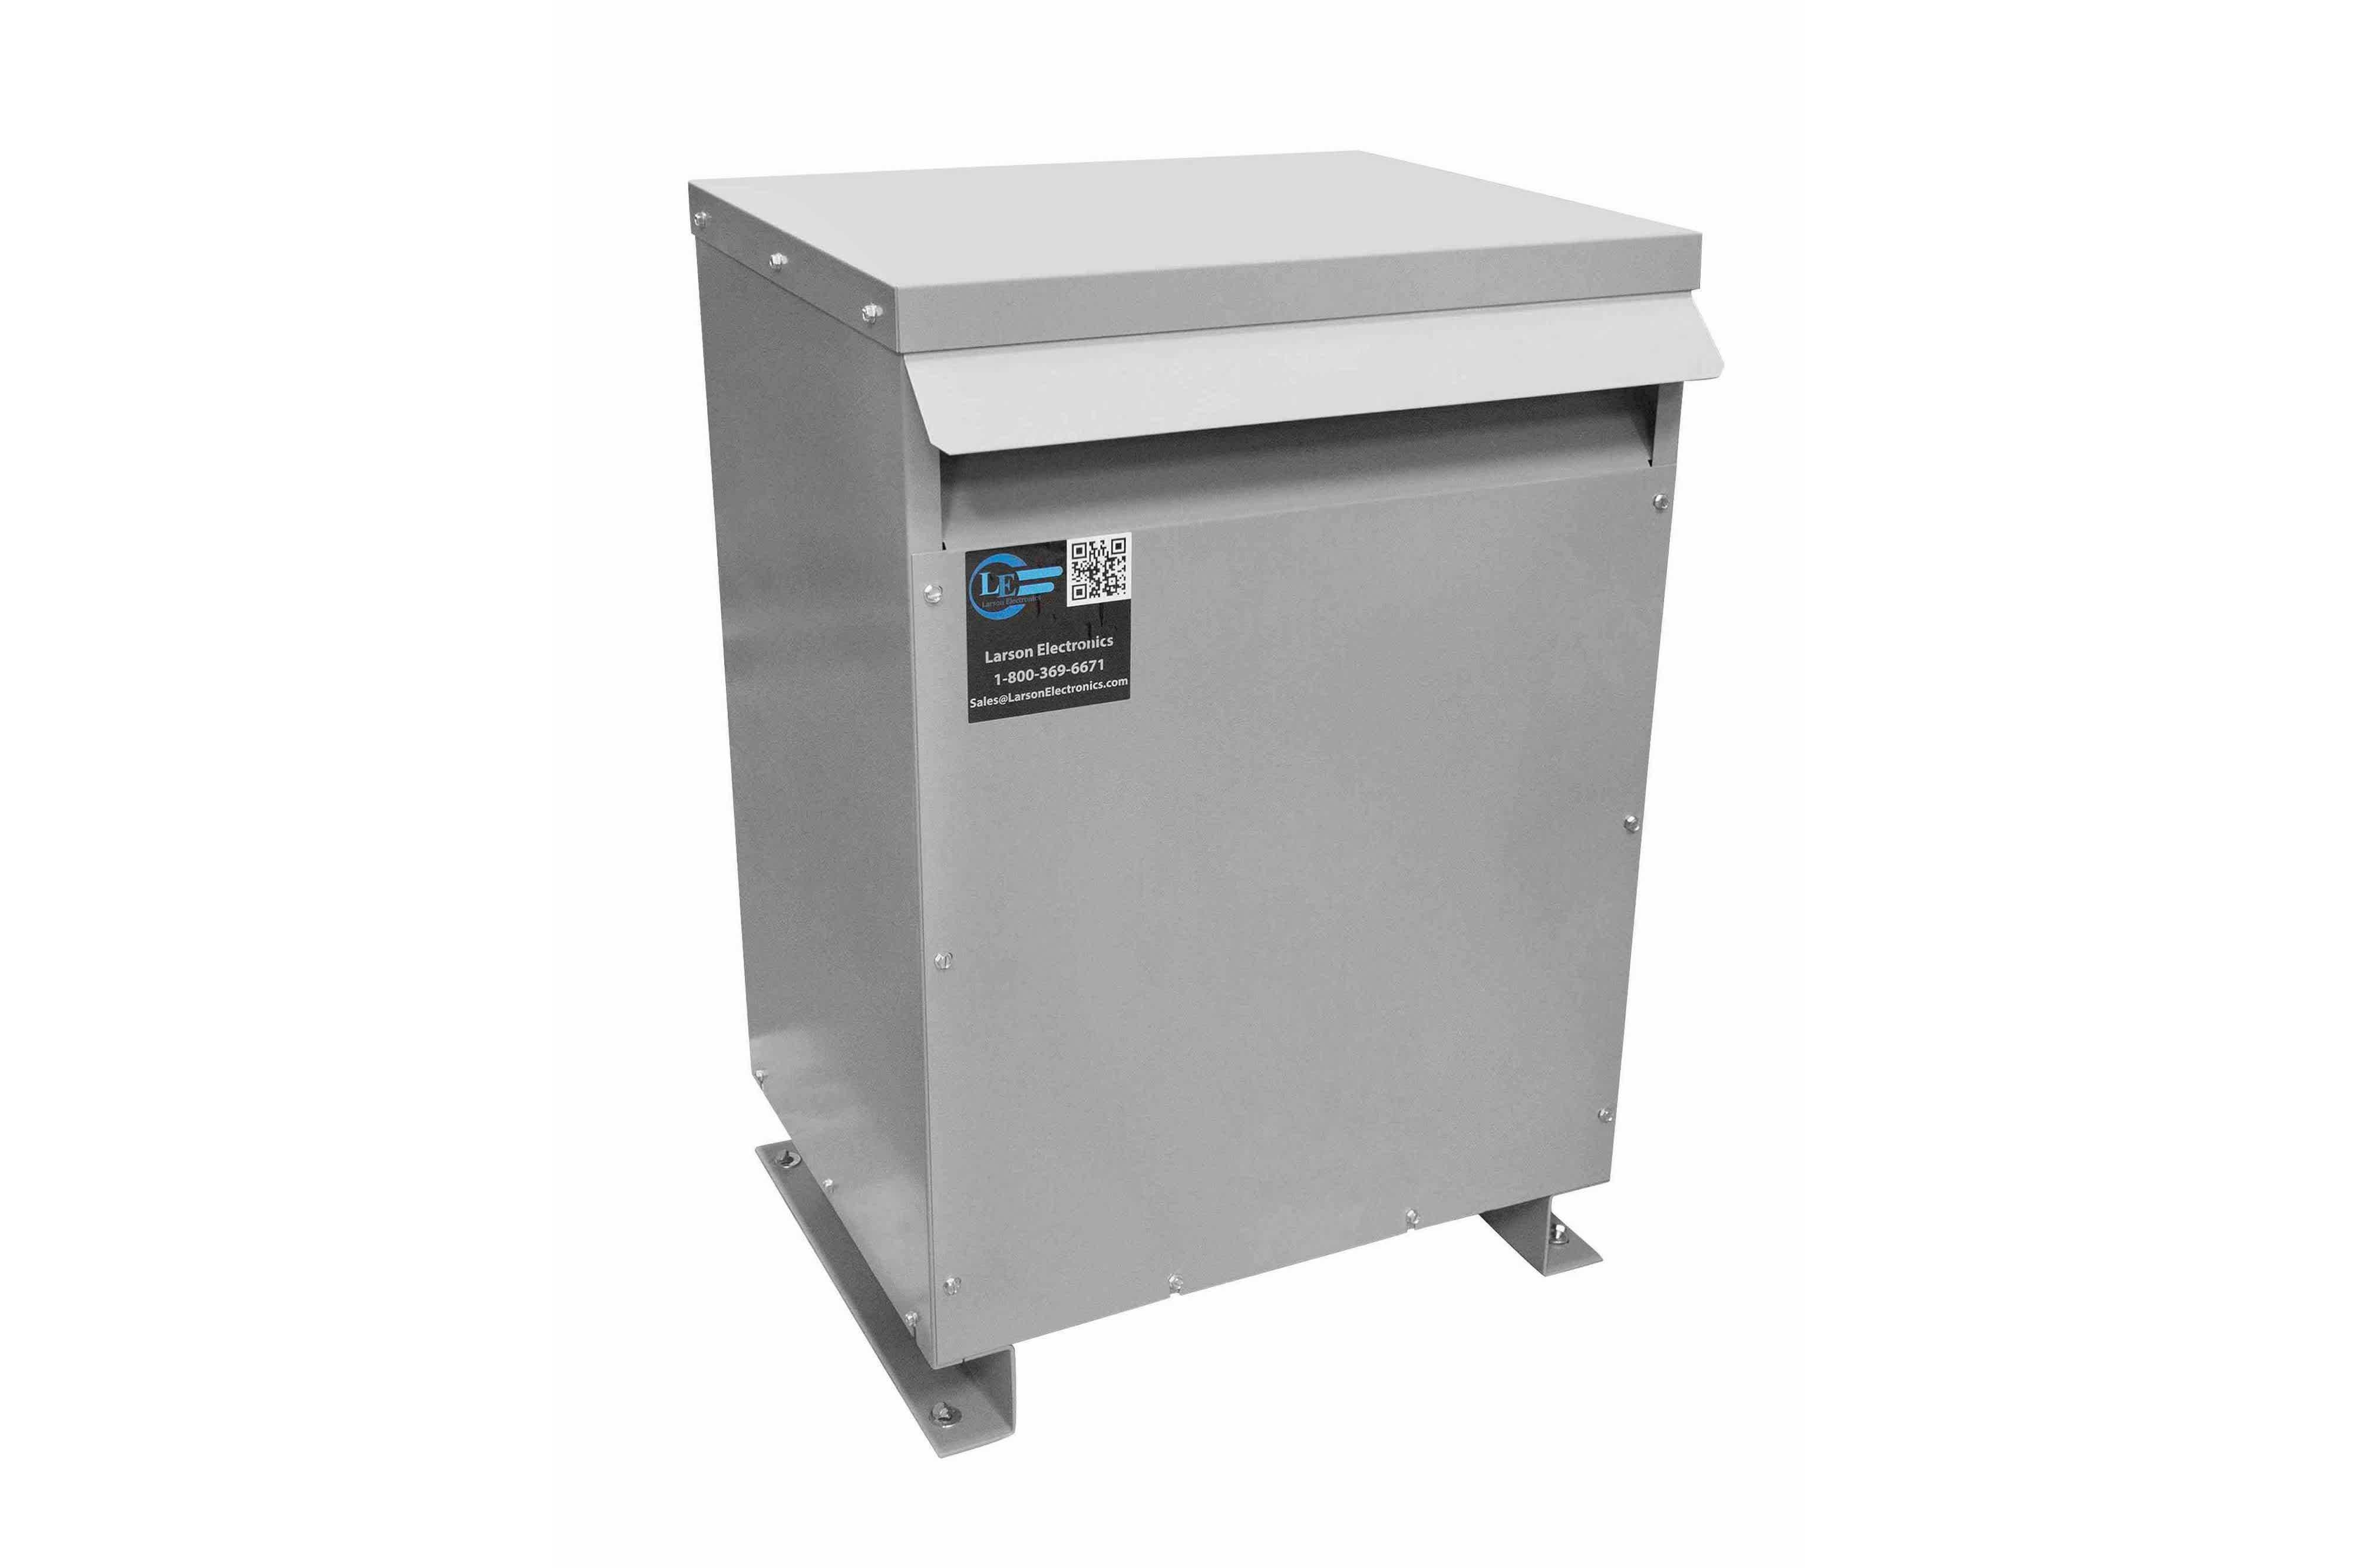 500 kVA 3PH Isolation Transformer, 460V Wye Primary, 575V Delta Secondary, N3R, Ventilated, 60 Hz